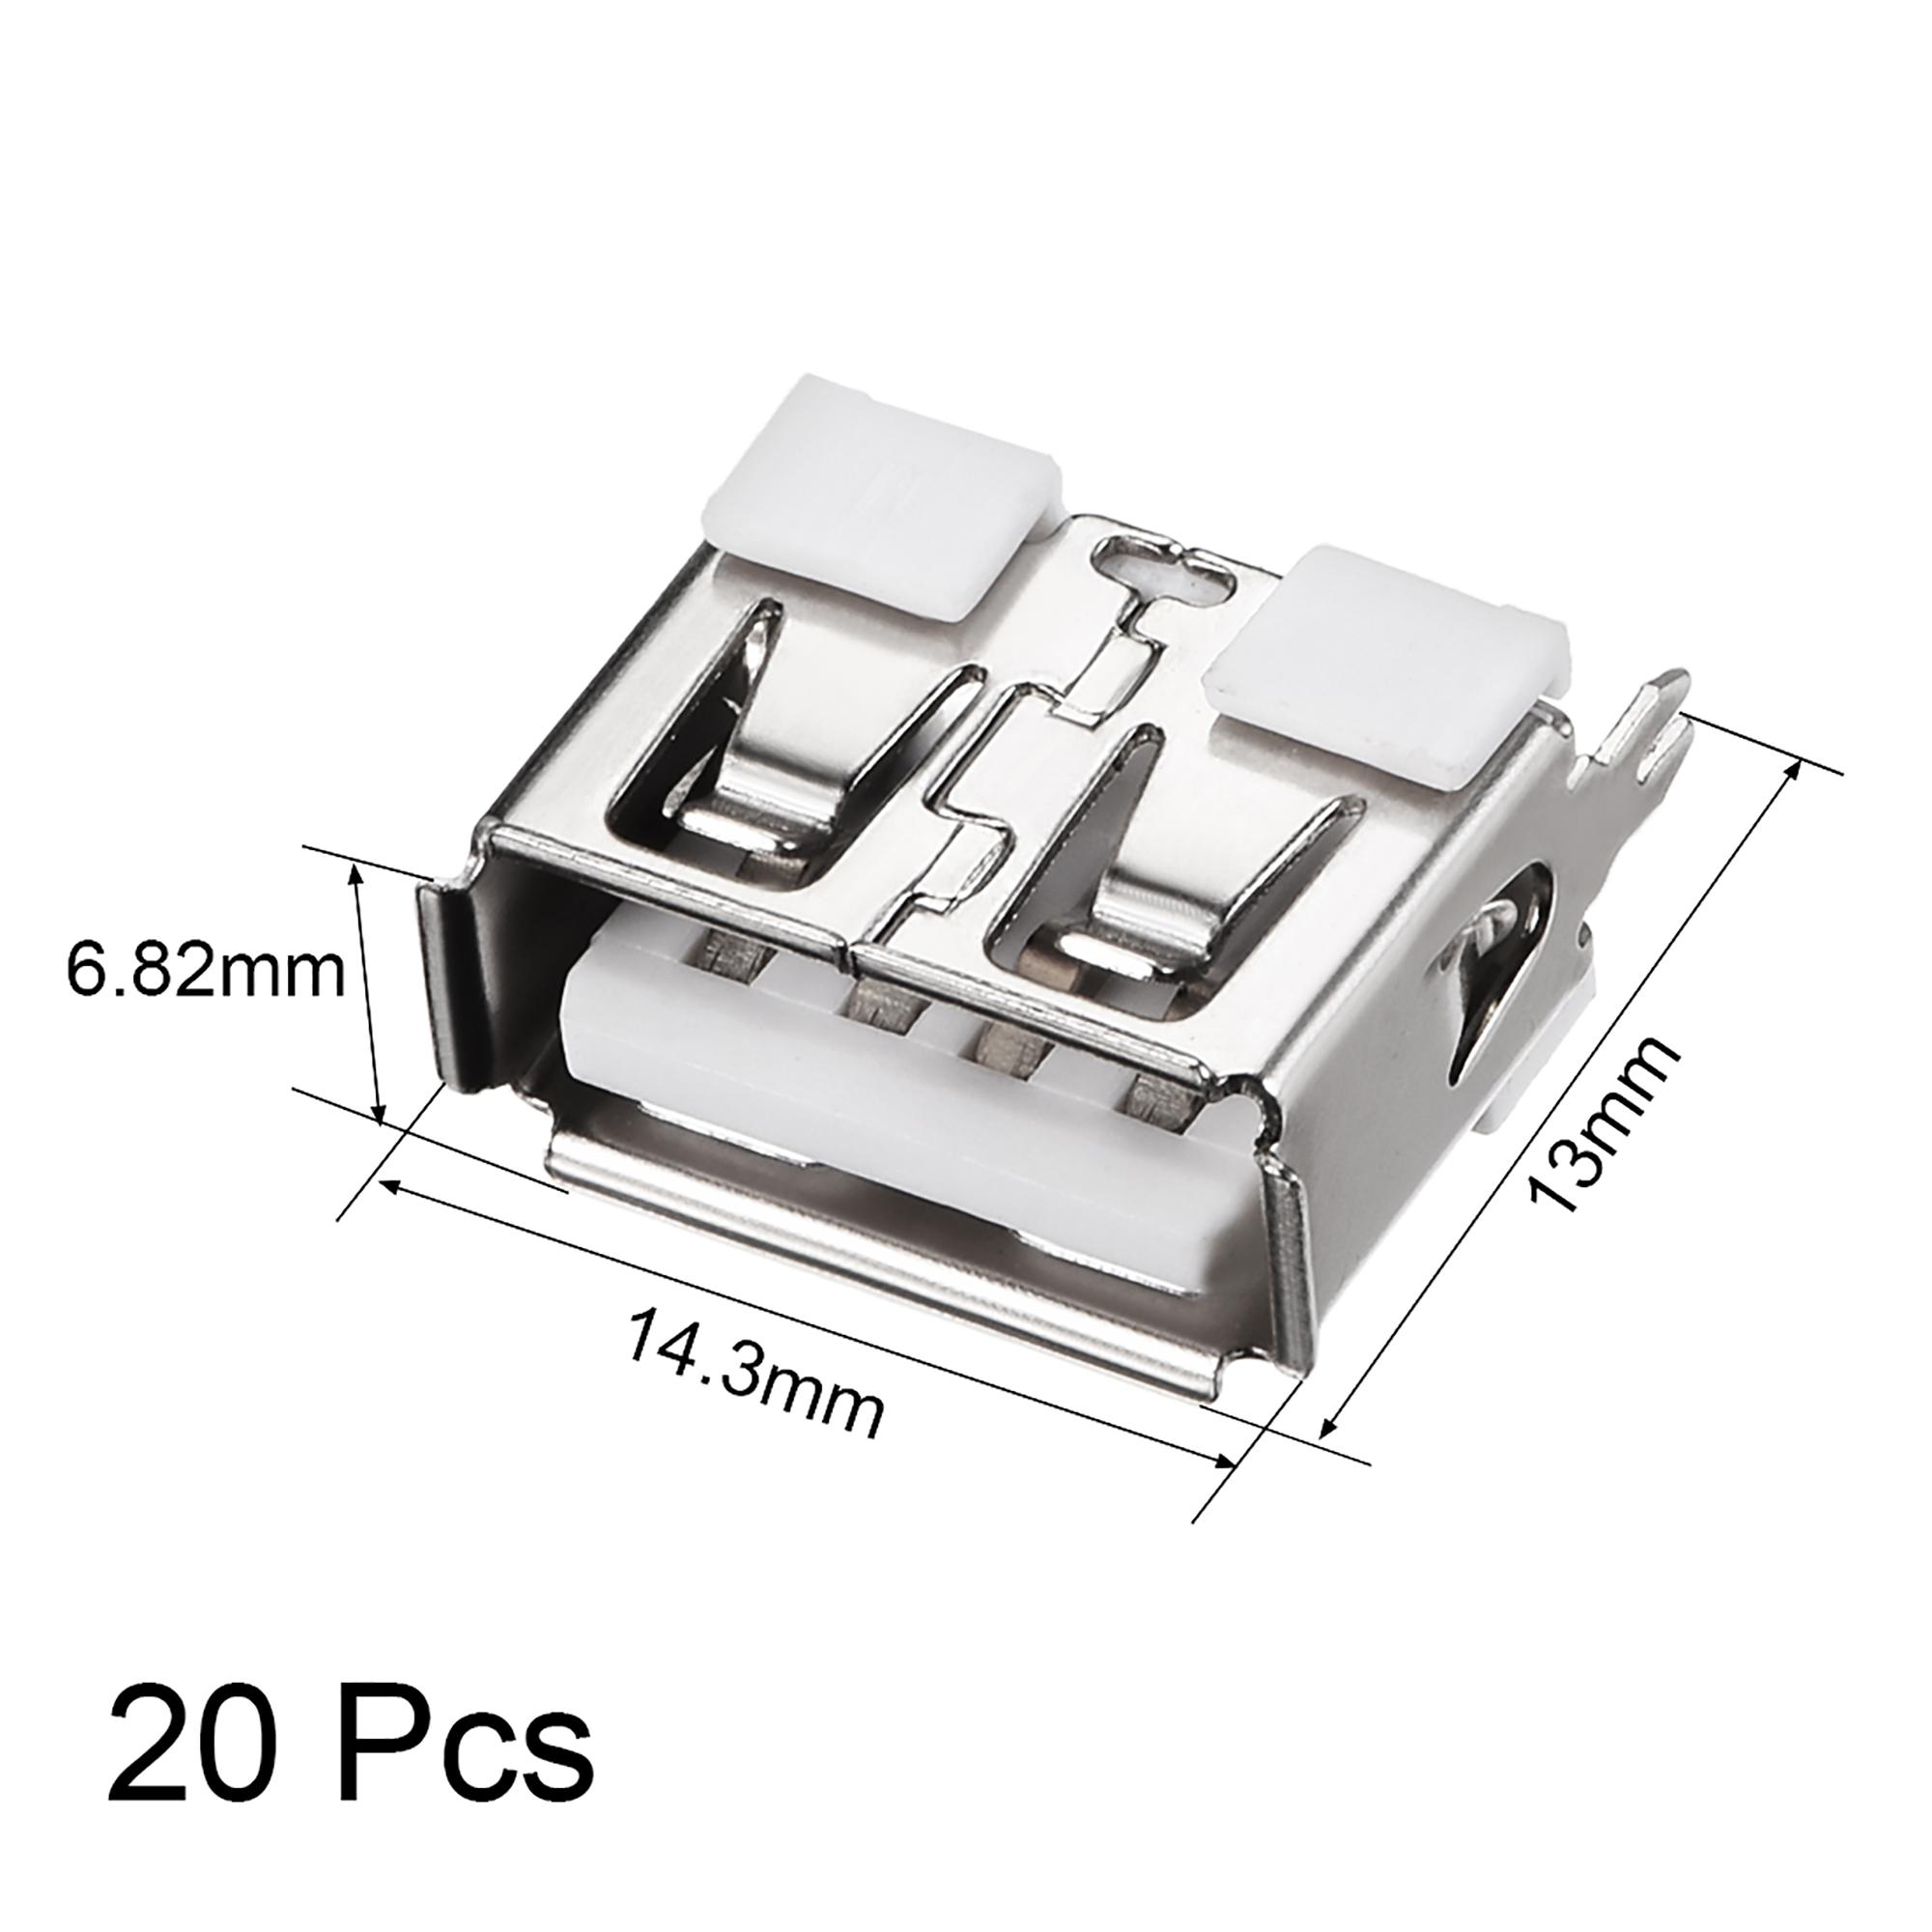 PCB USB Connector Type-A Female Jack Short Body 180 Degree Vertical Insert 20Pcs - image 1 de 4